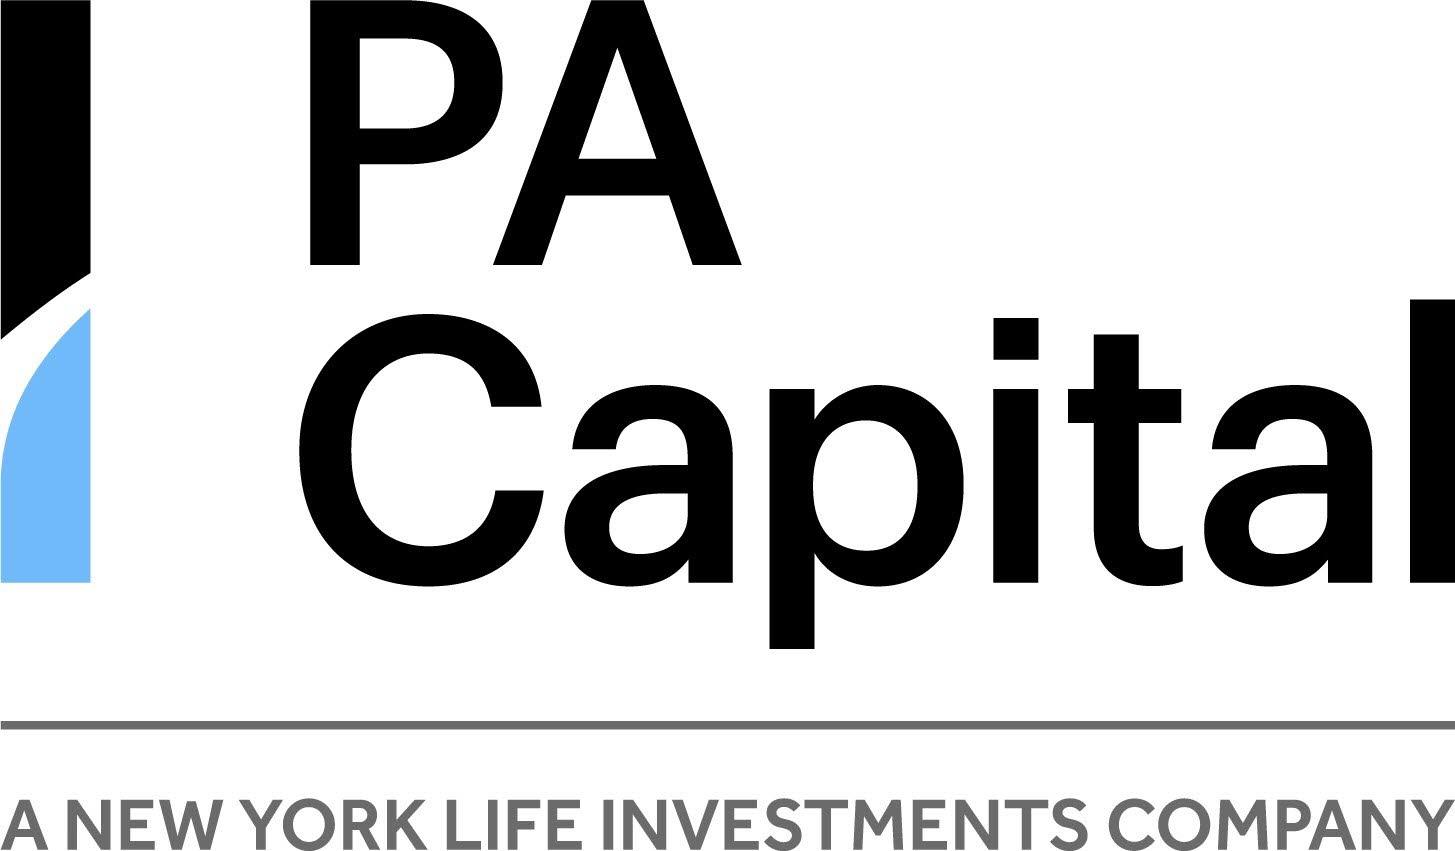 PA Capital_FullLogo_Color